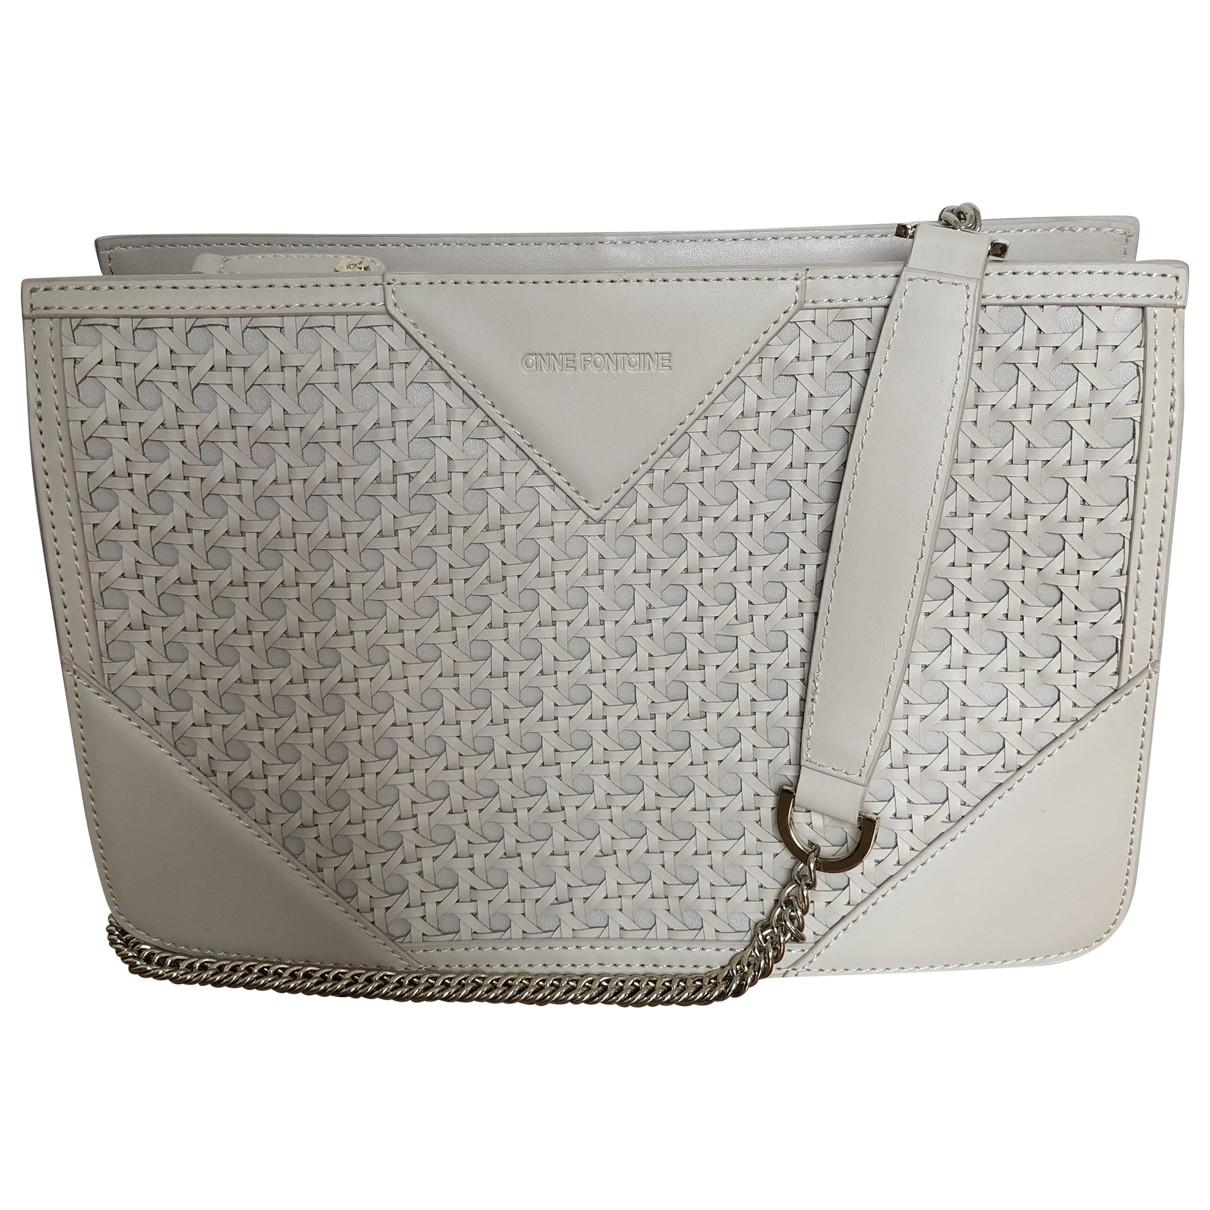 Anne Fontaine \N Beige Leather handbag for Women \N